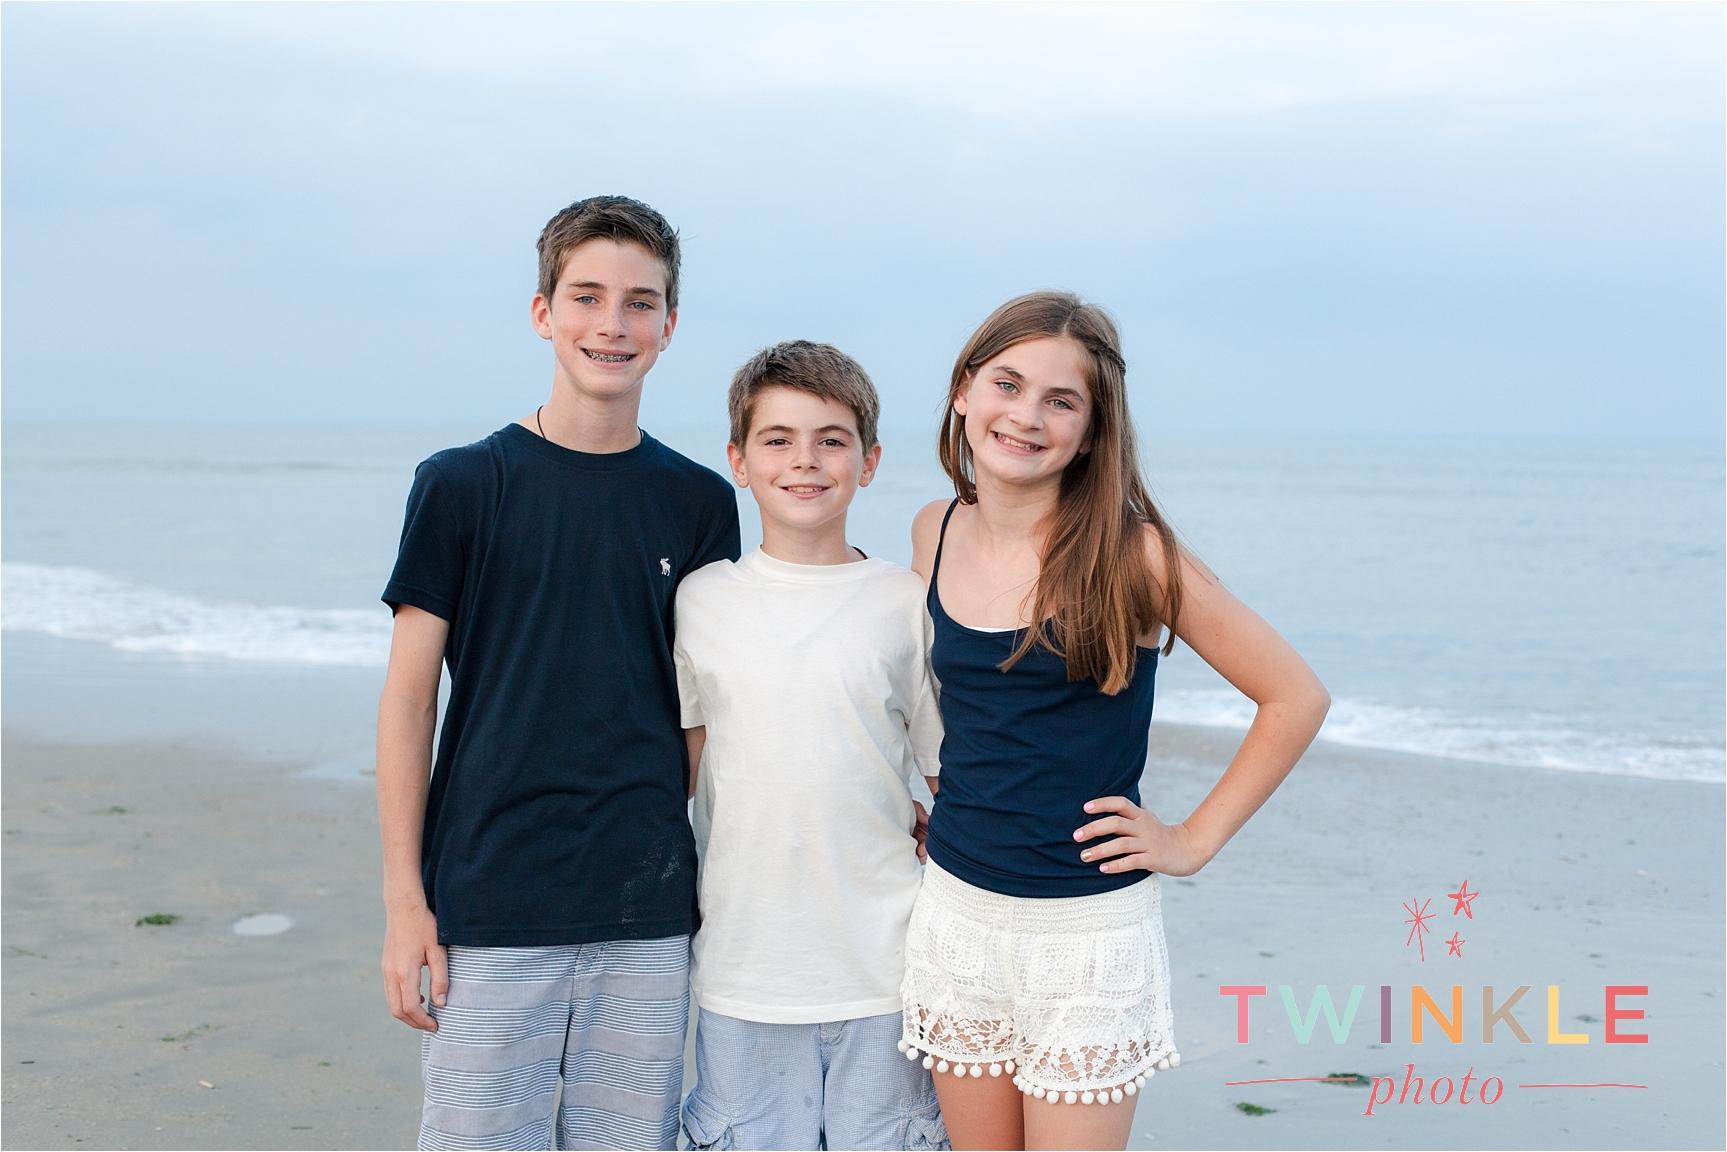 OCNJ Ocean City New Jersey Beach Photography 10